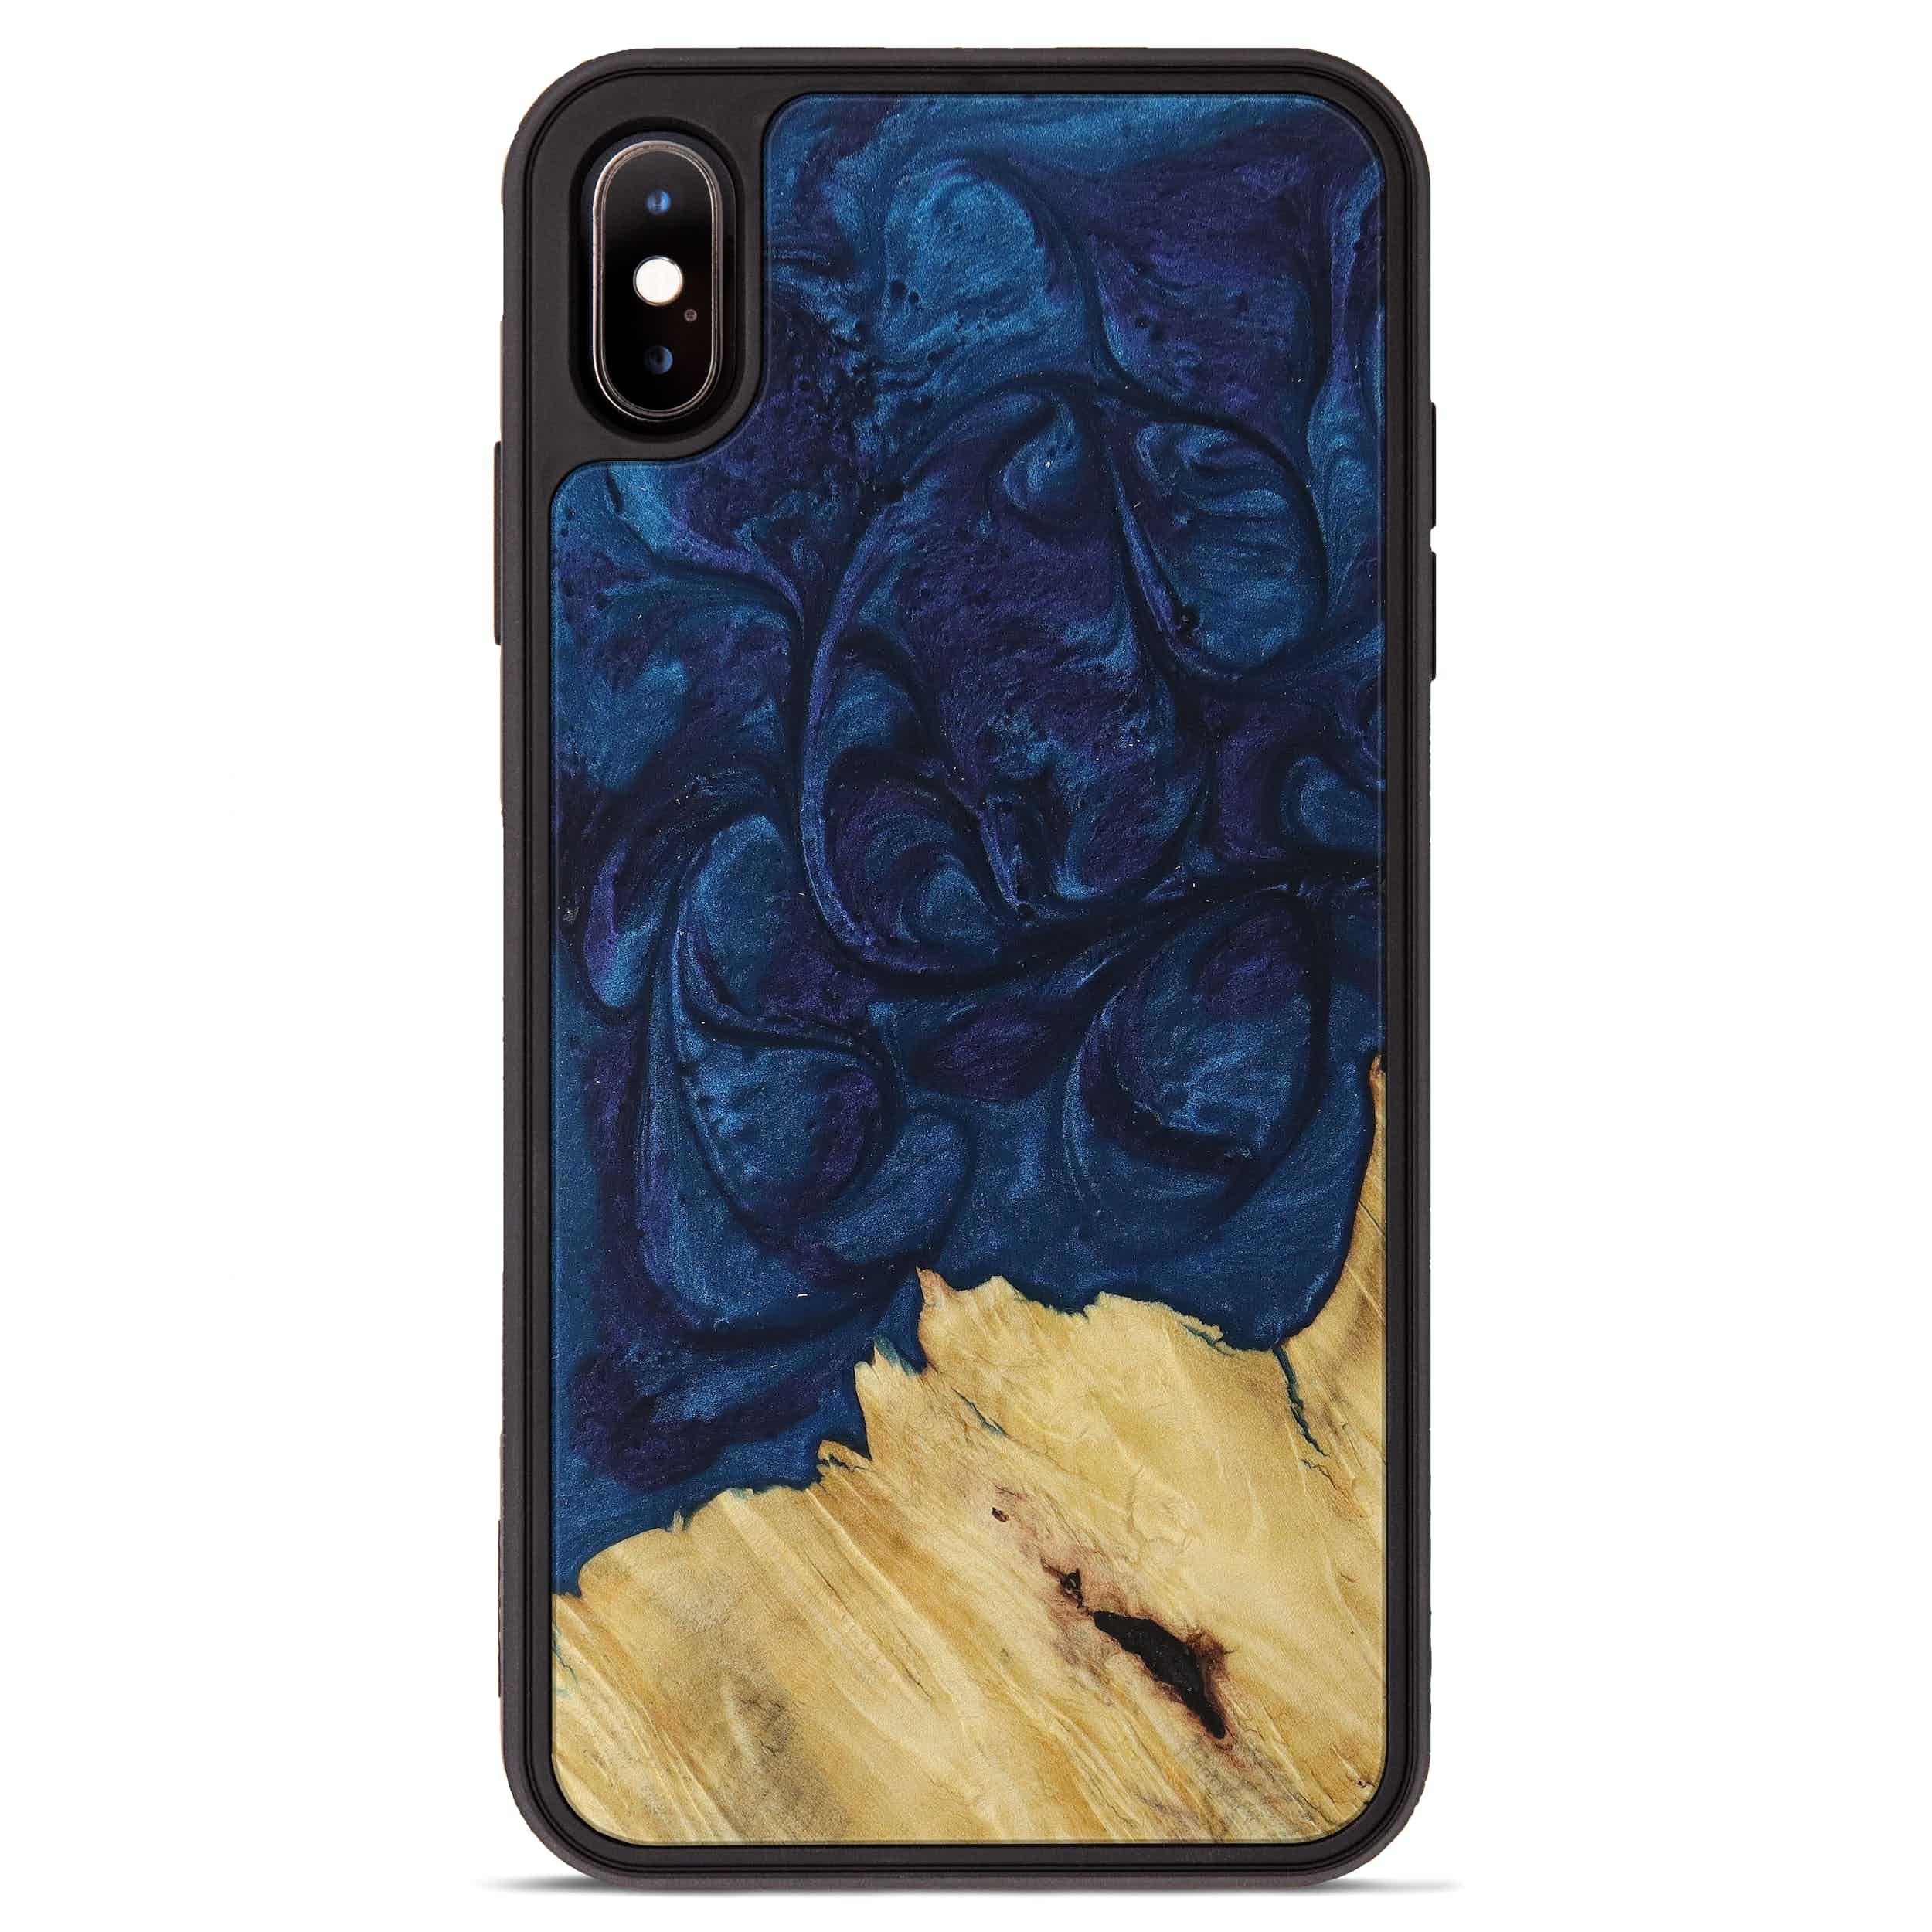 iPhone Xs Max Wood+Resin Phone Case - Izumi (Dark Blue, 394715)